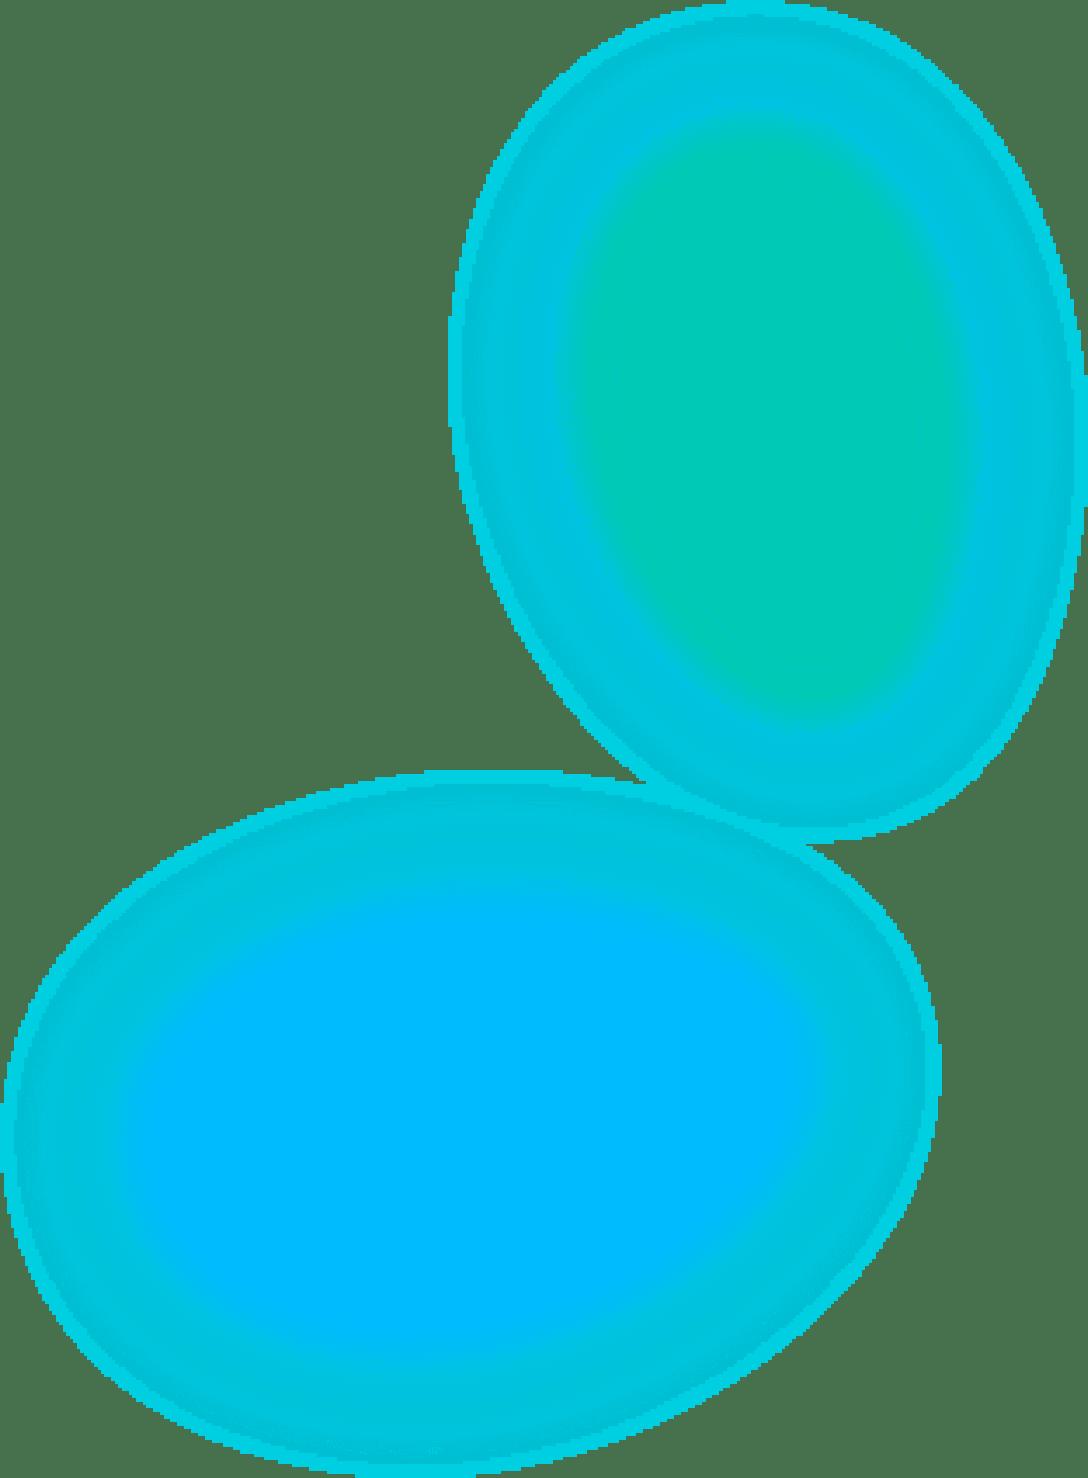 bluegreen-green-bg